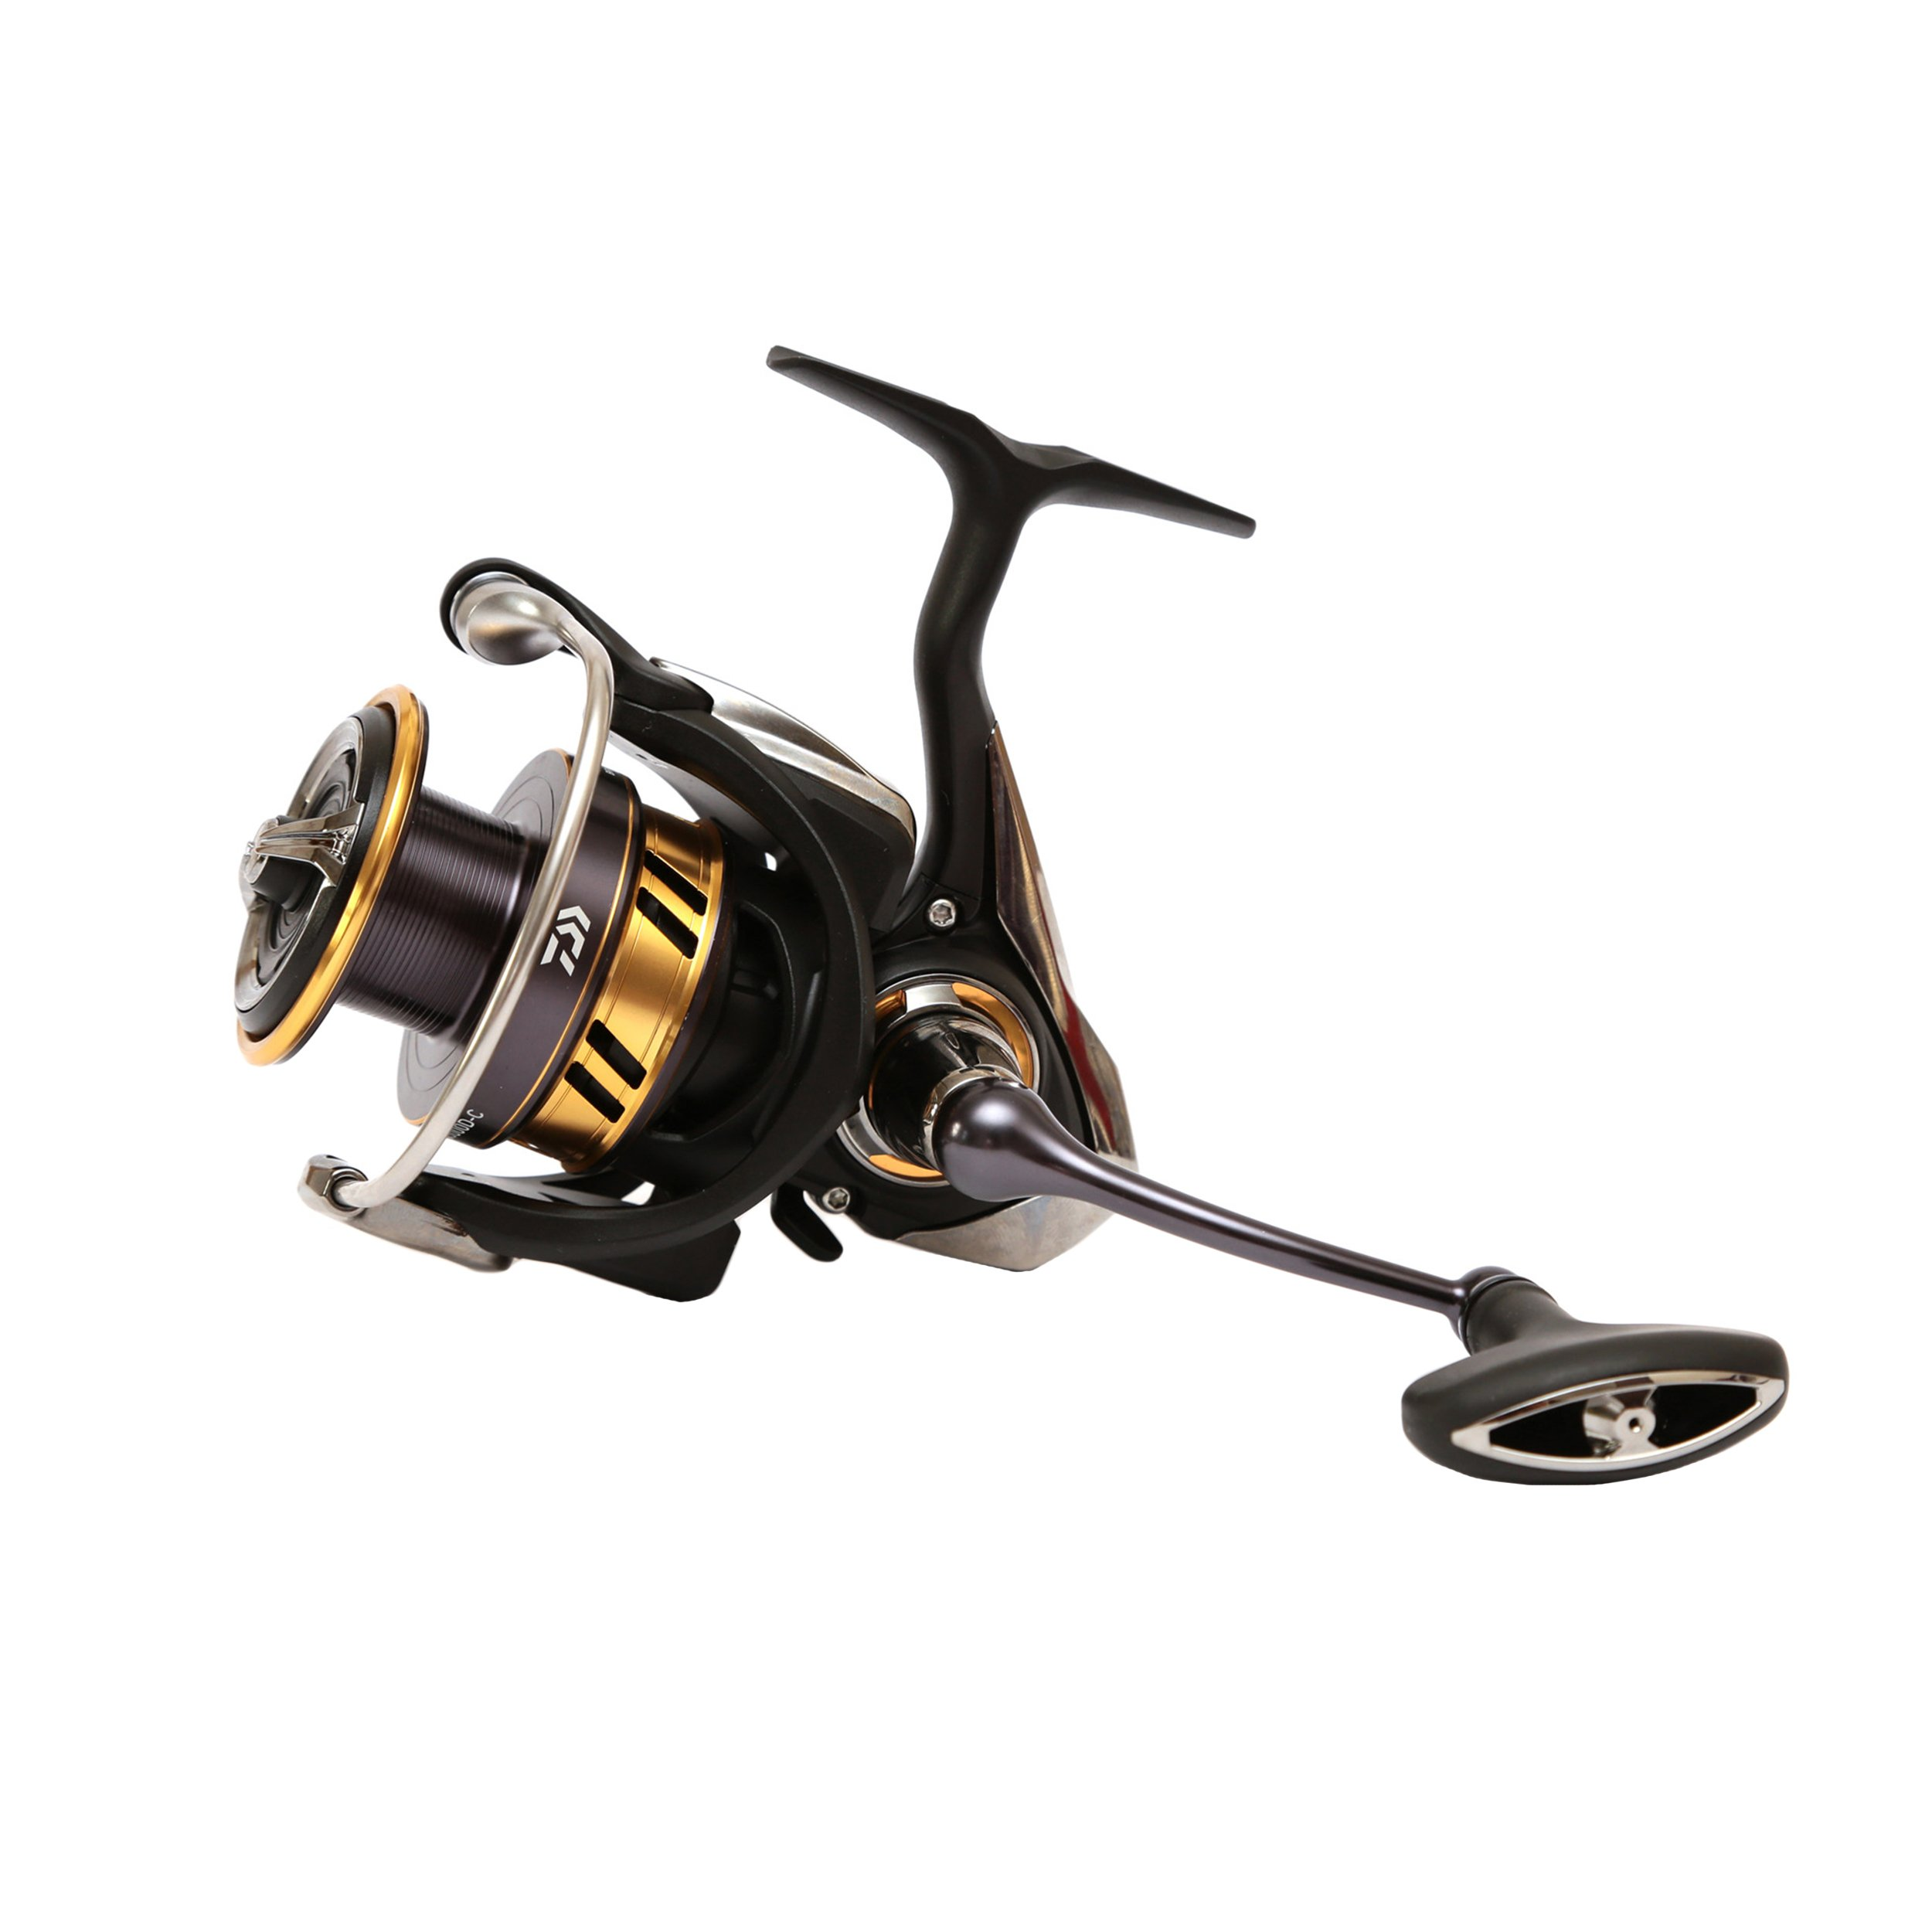 LGLT4000D-C Daiwa Legalis LT 5.2:1 Left//Right Hand Spinning Fishing Reel